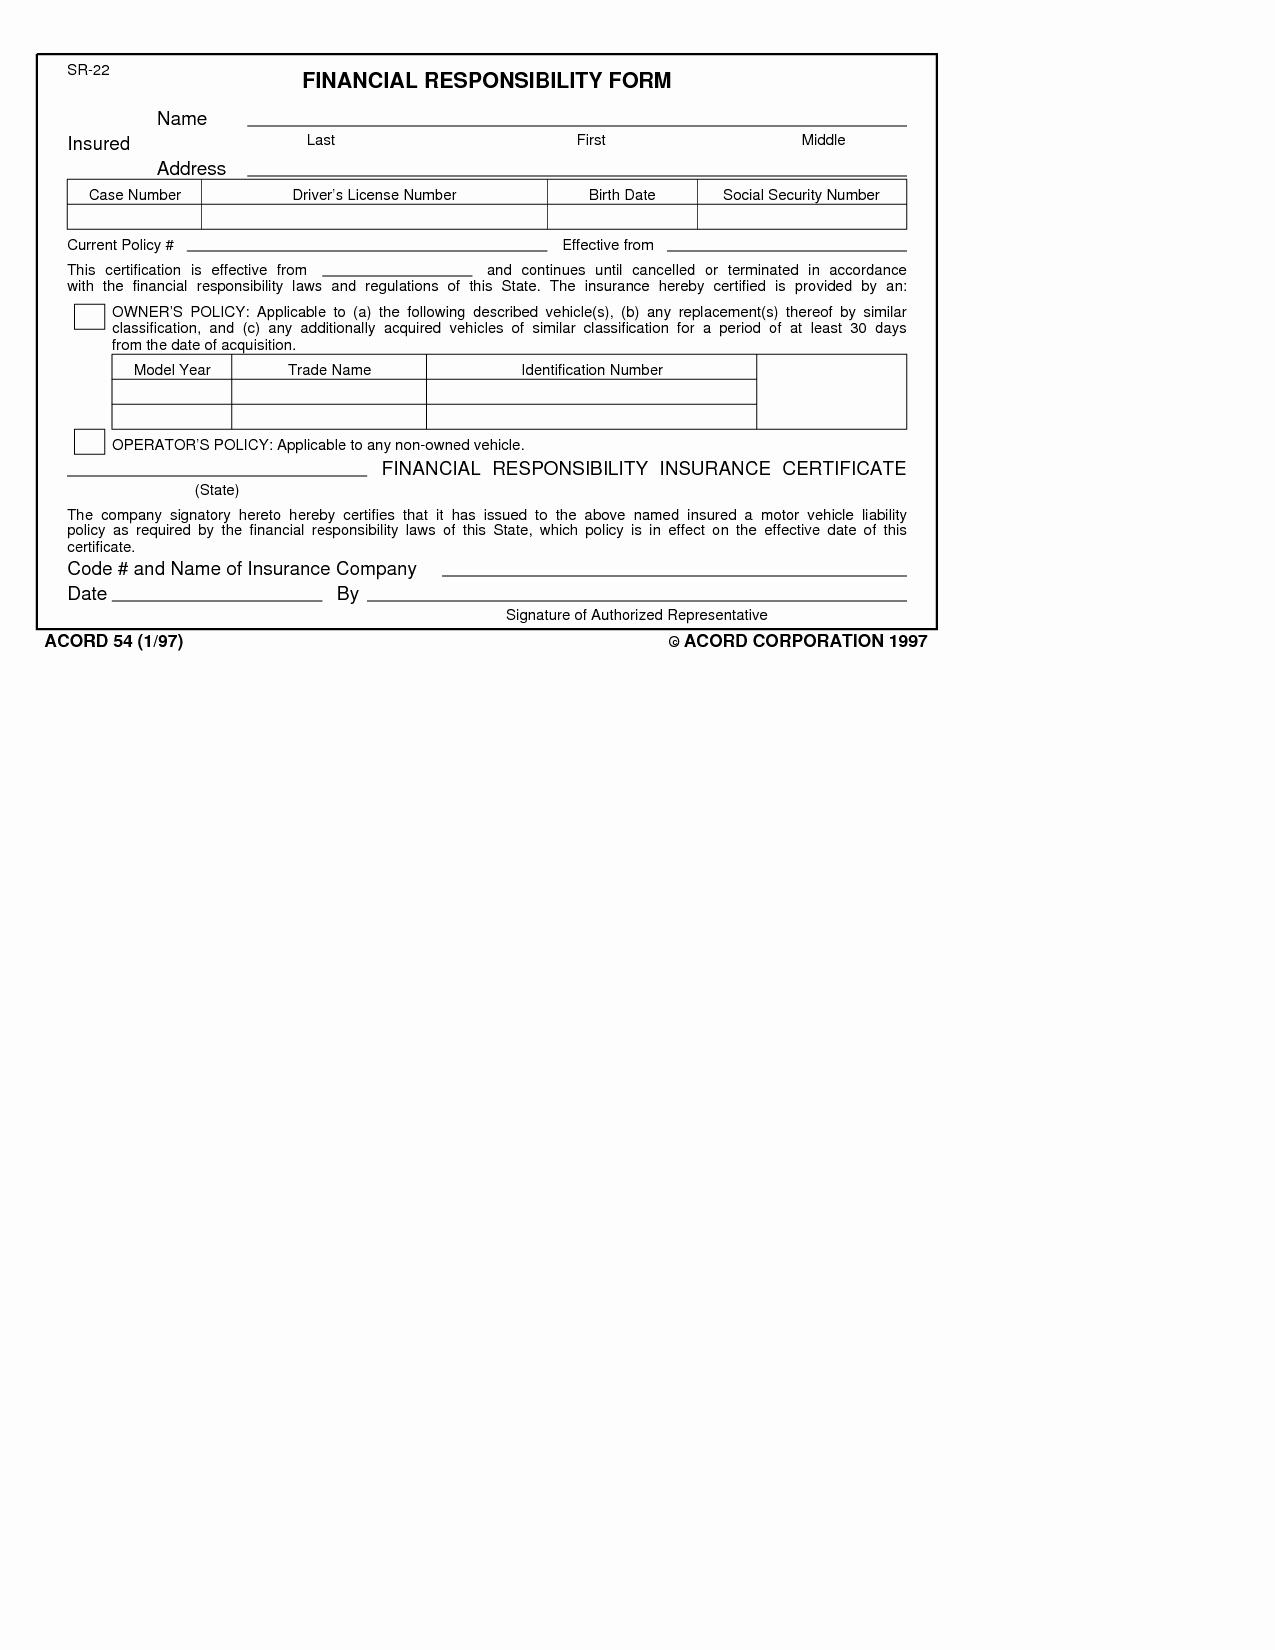 Car Insurance Card Template New Texas Liability Insurance Card